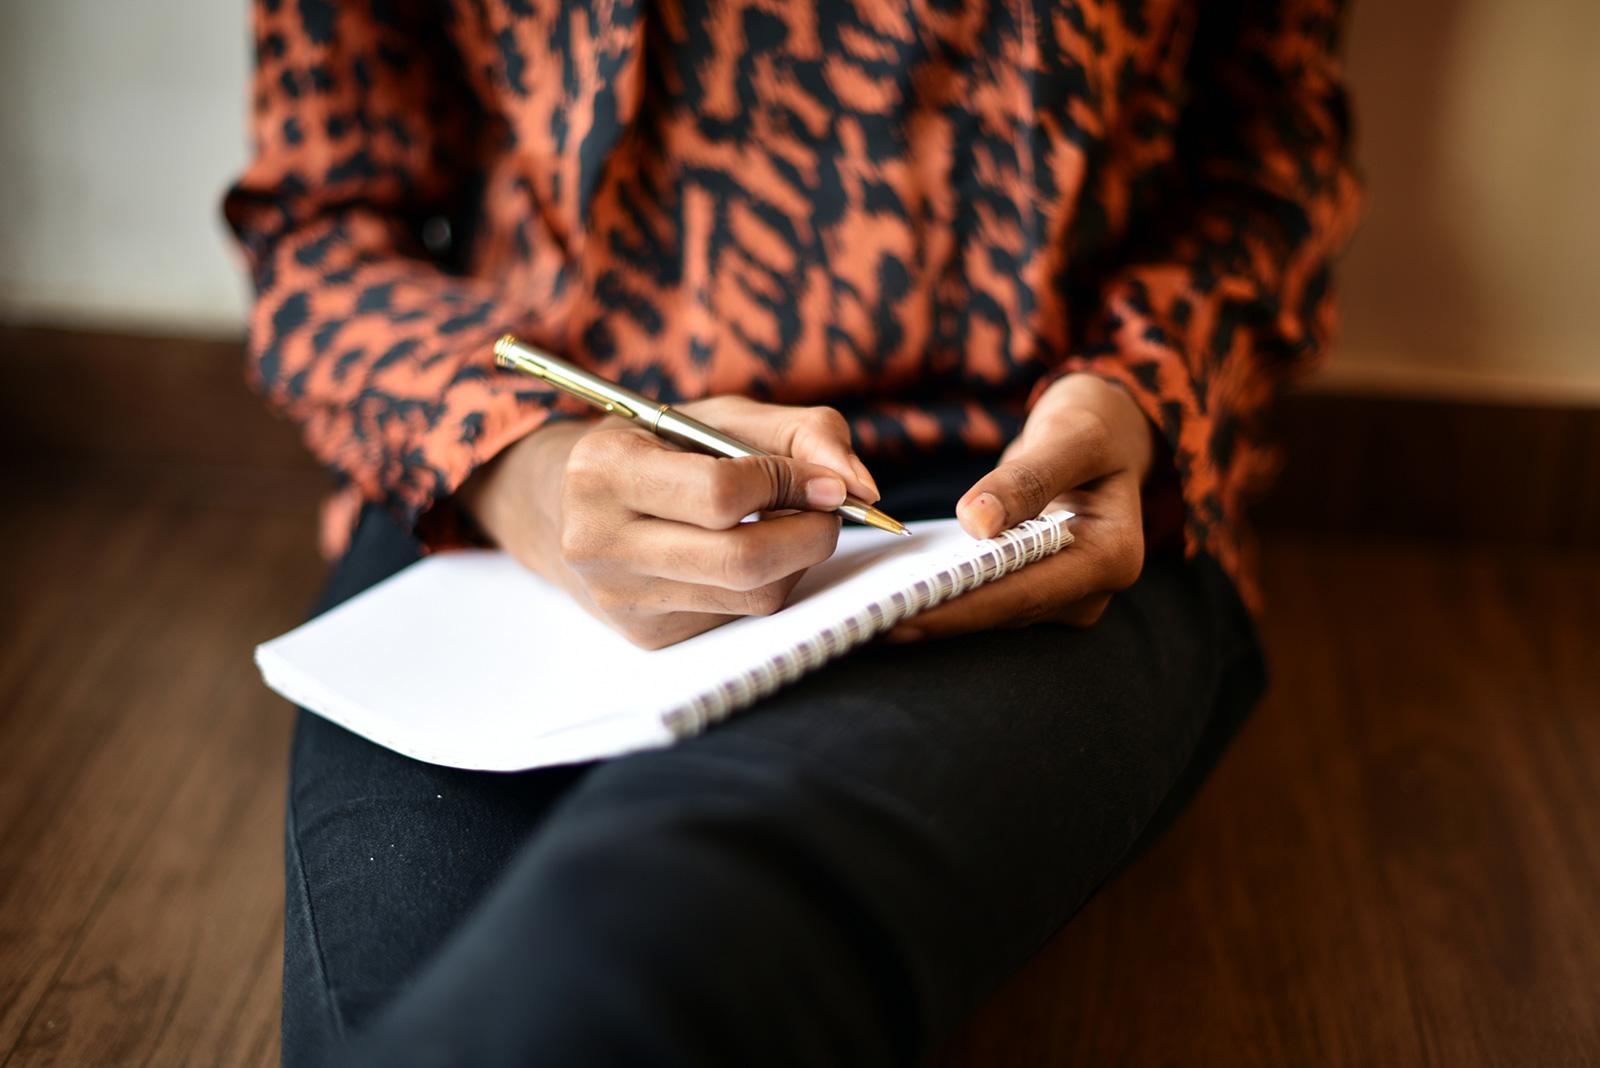 woman-writing-on-pad.jpg